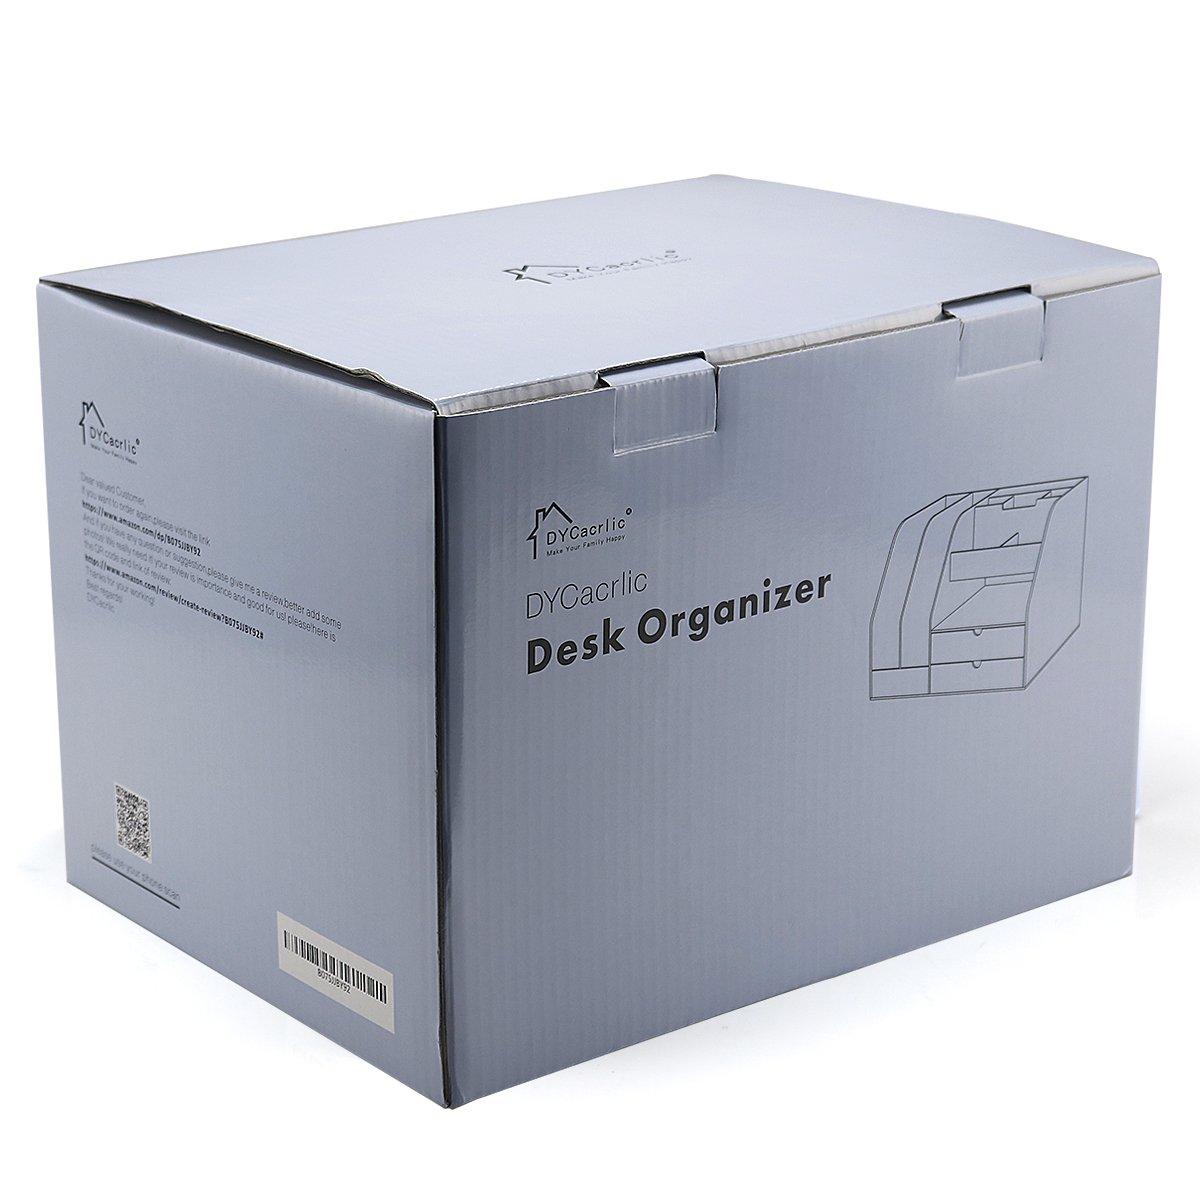 DYCacrlic Desktop Organizer for Home Office Supplies Files Pen and Desk Accessories Organization,Clear Big Desktop Organizer Box 2 set Drawers,Office Desktop Organizer Stand Holder Shelf,Cute,Supply